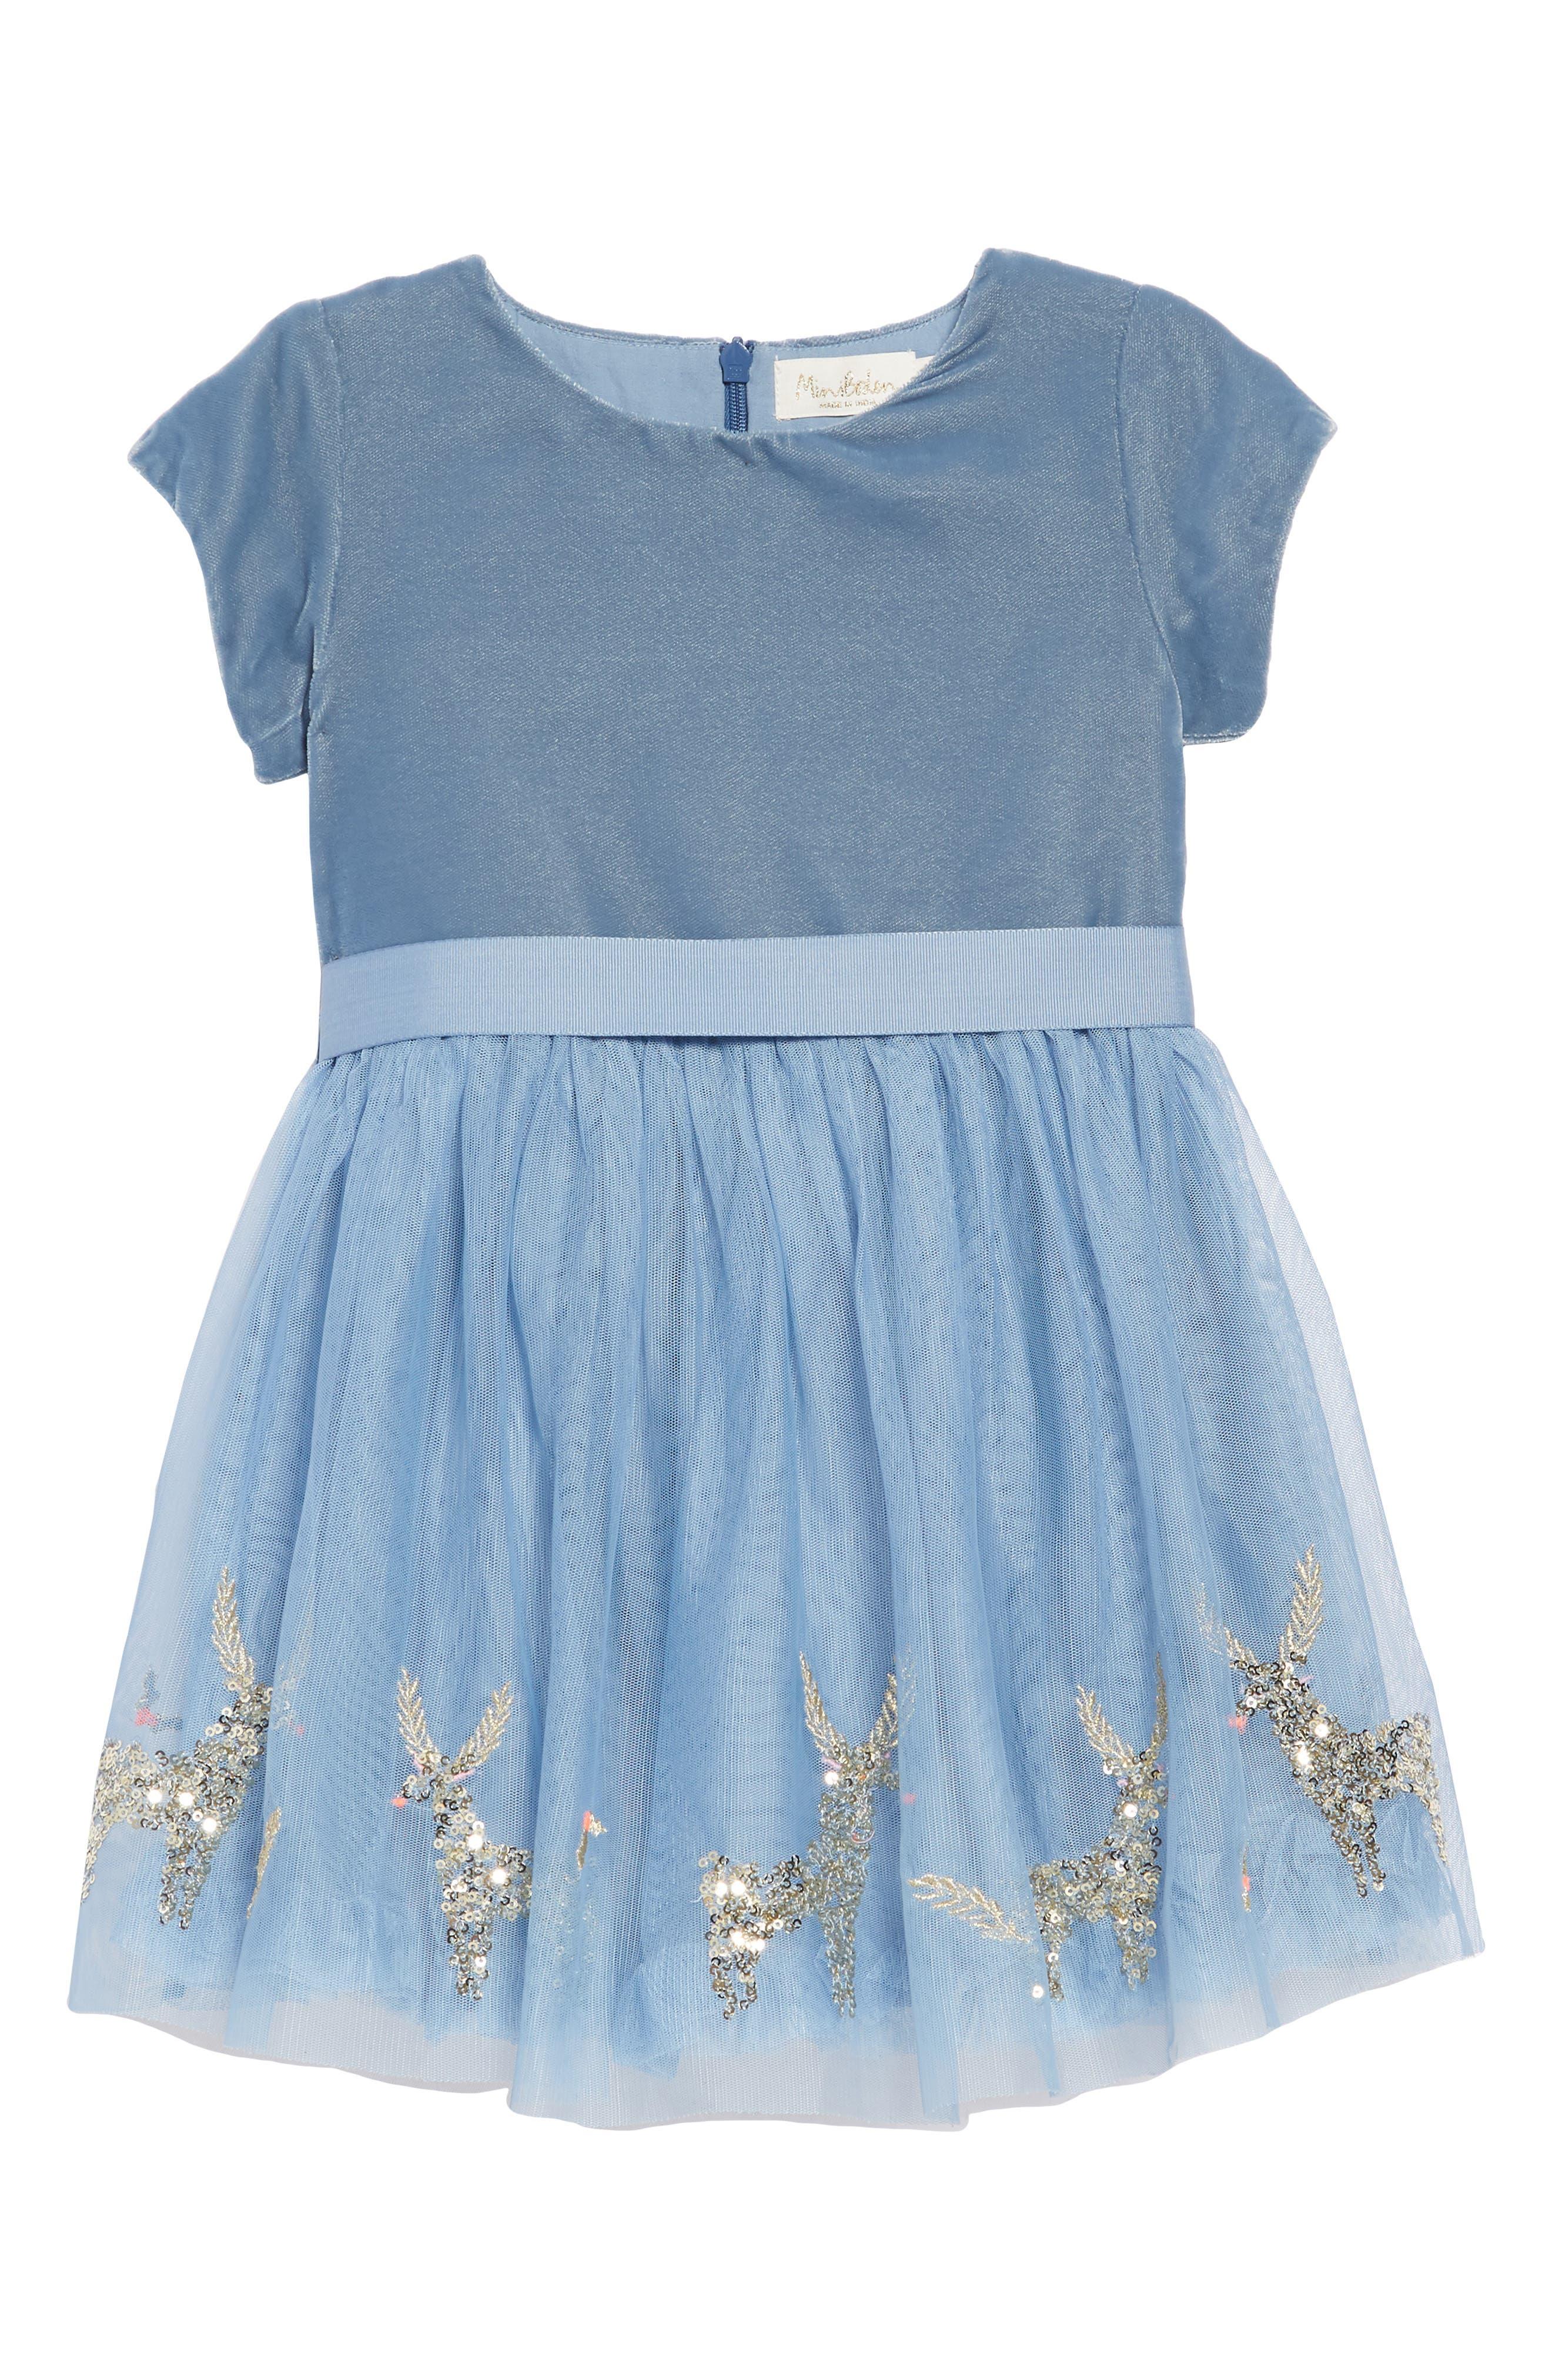 Girls Mini Boden Velvet  Tulle Applique Party Dress Size 1112Y  Blue